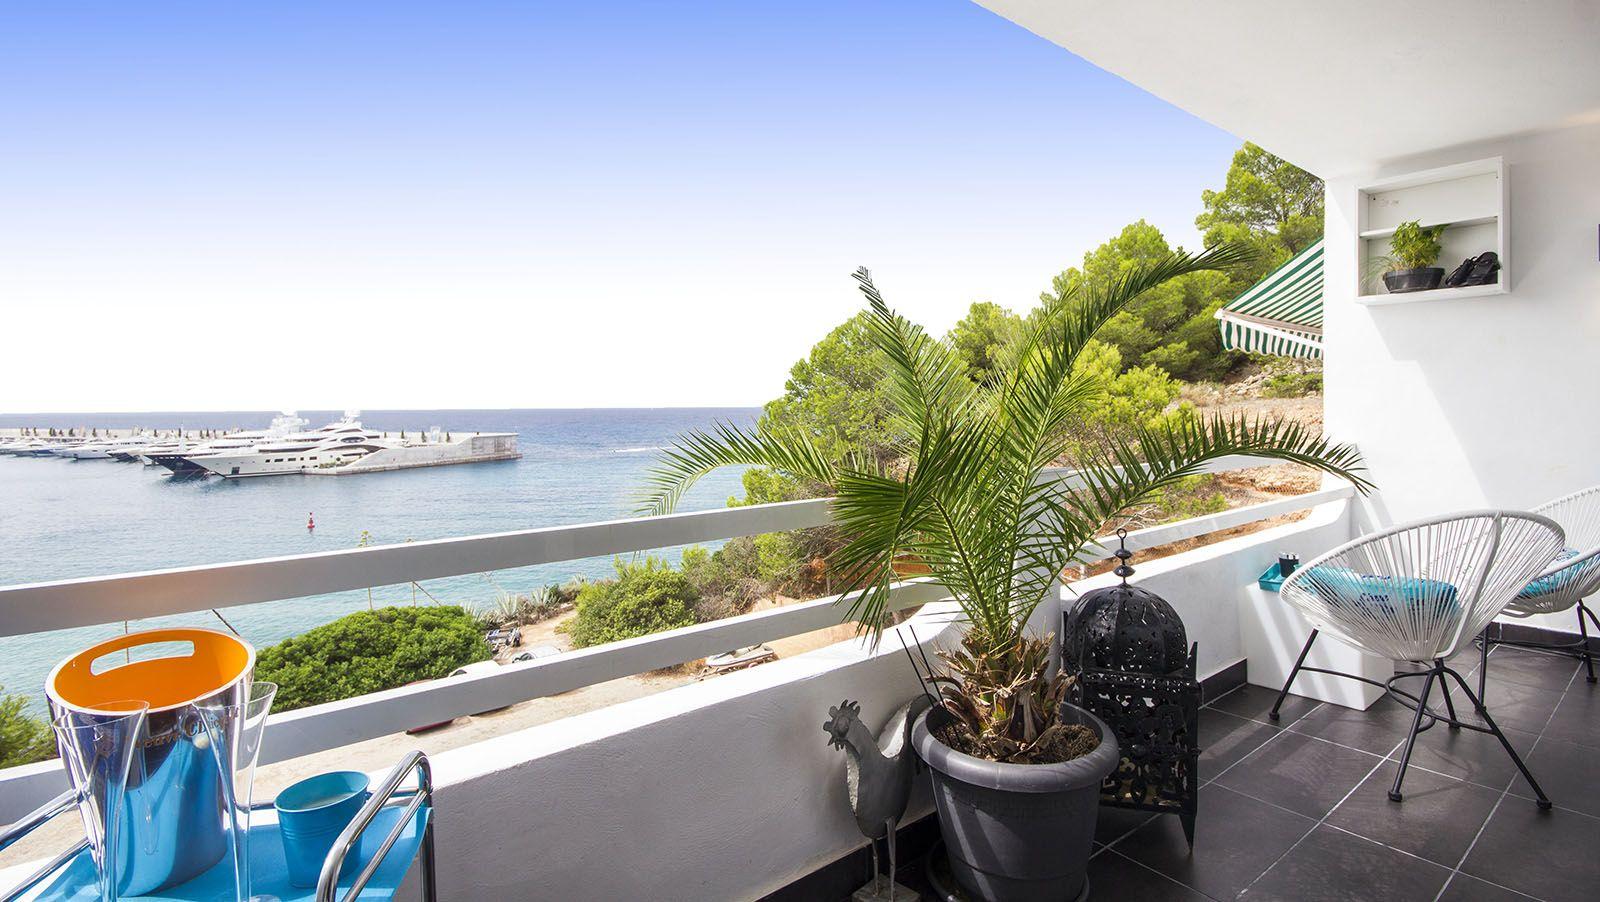 Beliebte Lage Immobilien Mallorca in erster Meereslinie